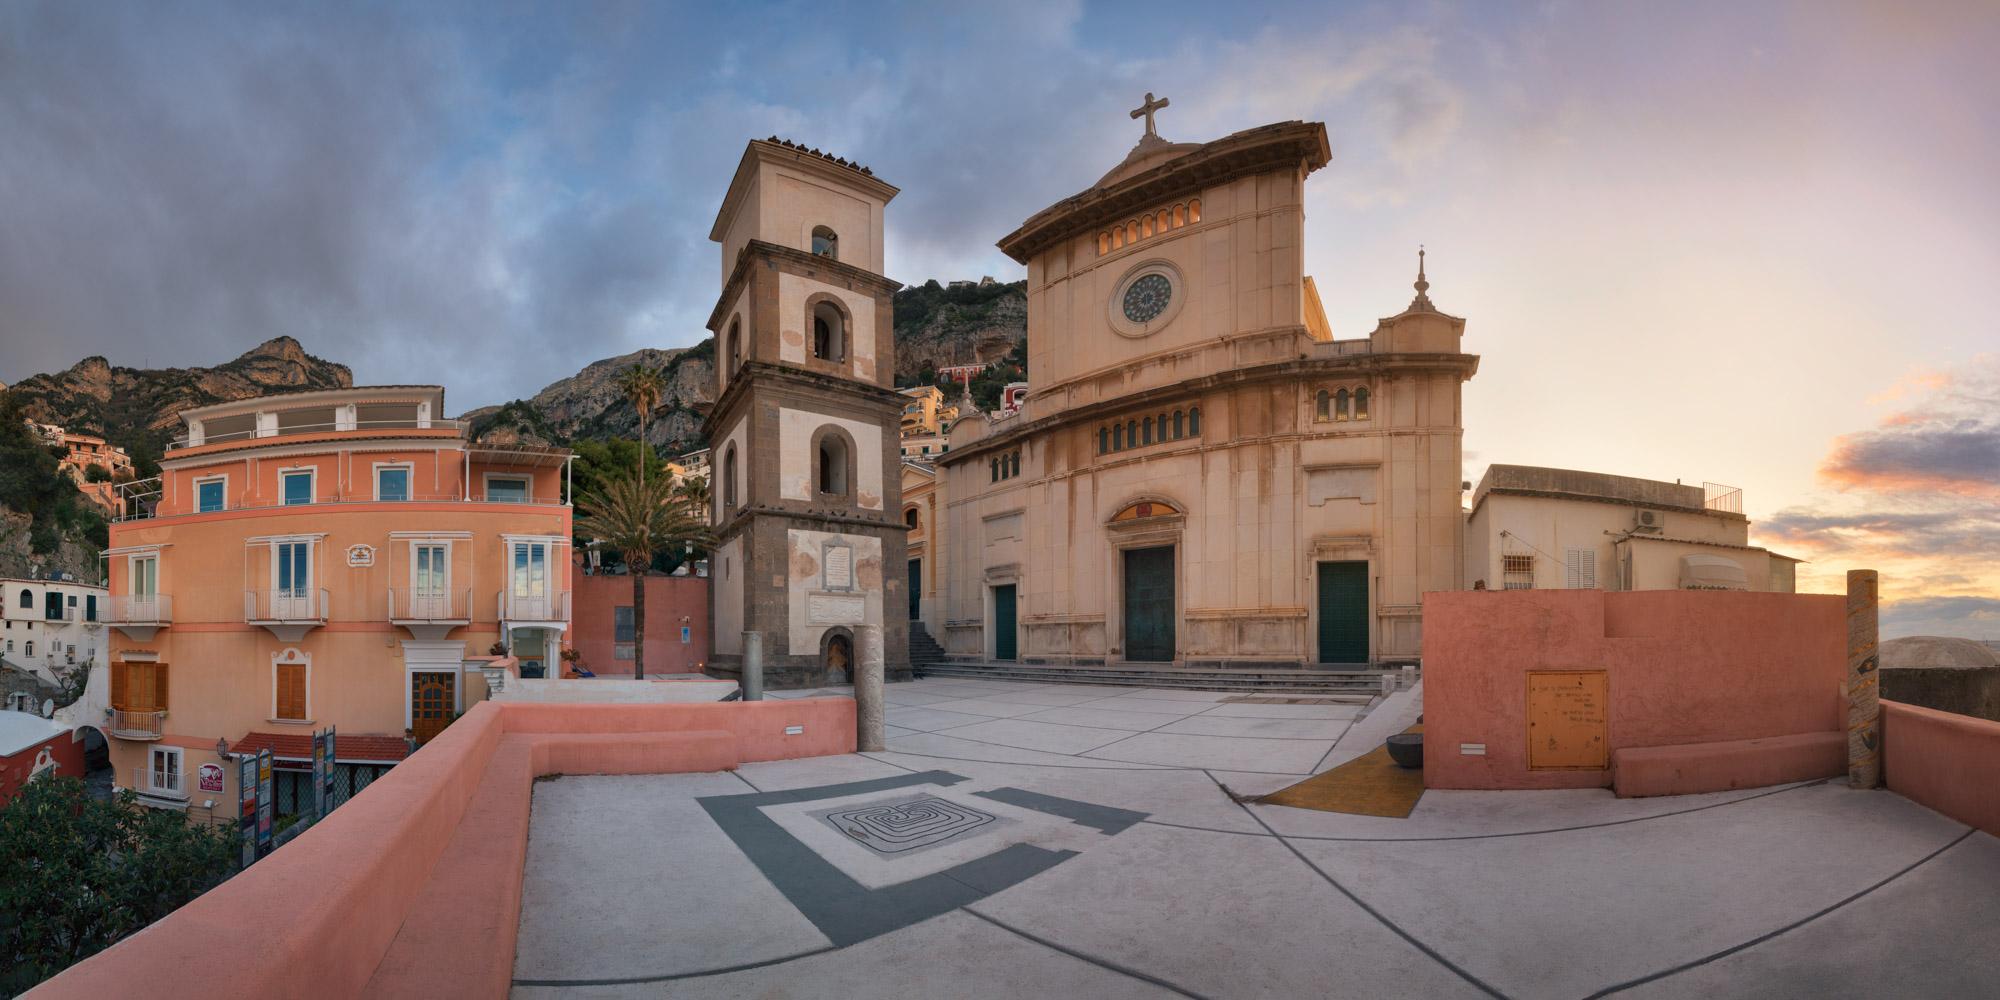 Church of Saint Mary of the Assumption, Positano, Amalfi Coast,